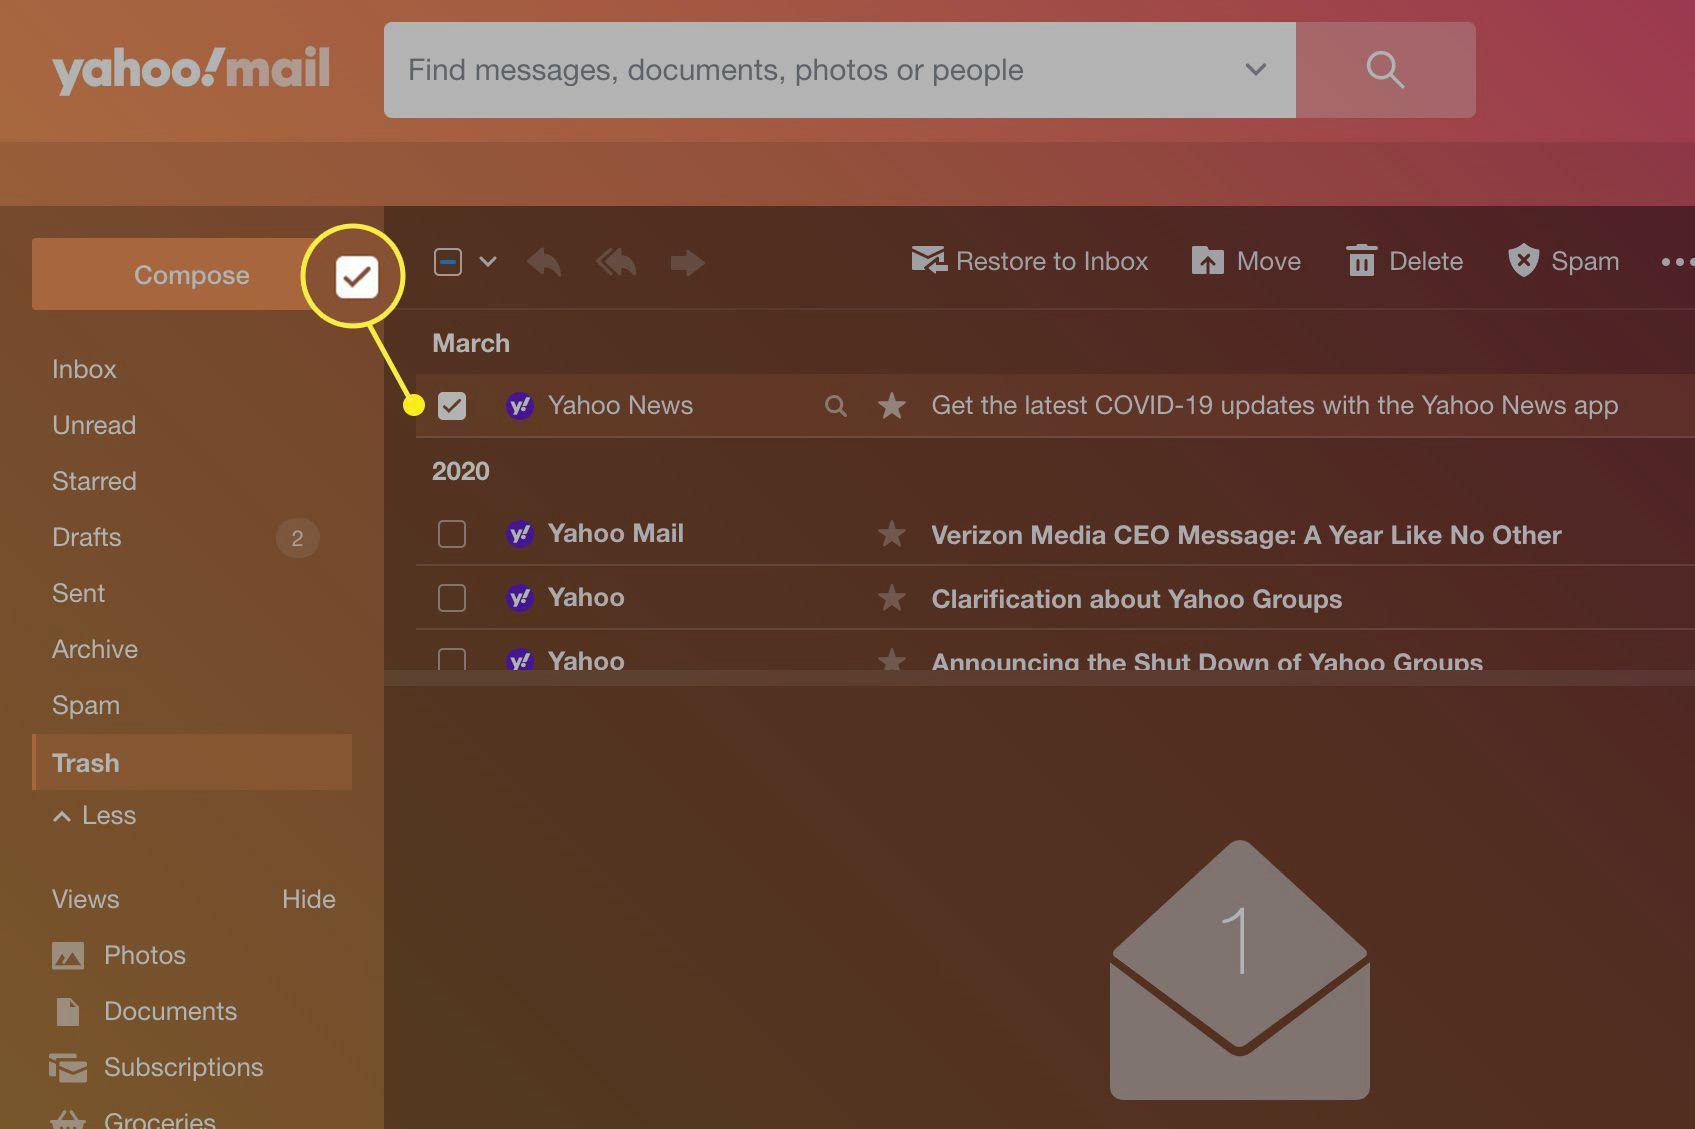 Yahoo Mail checked box